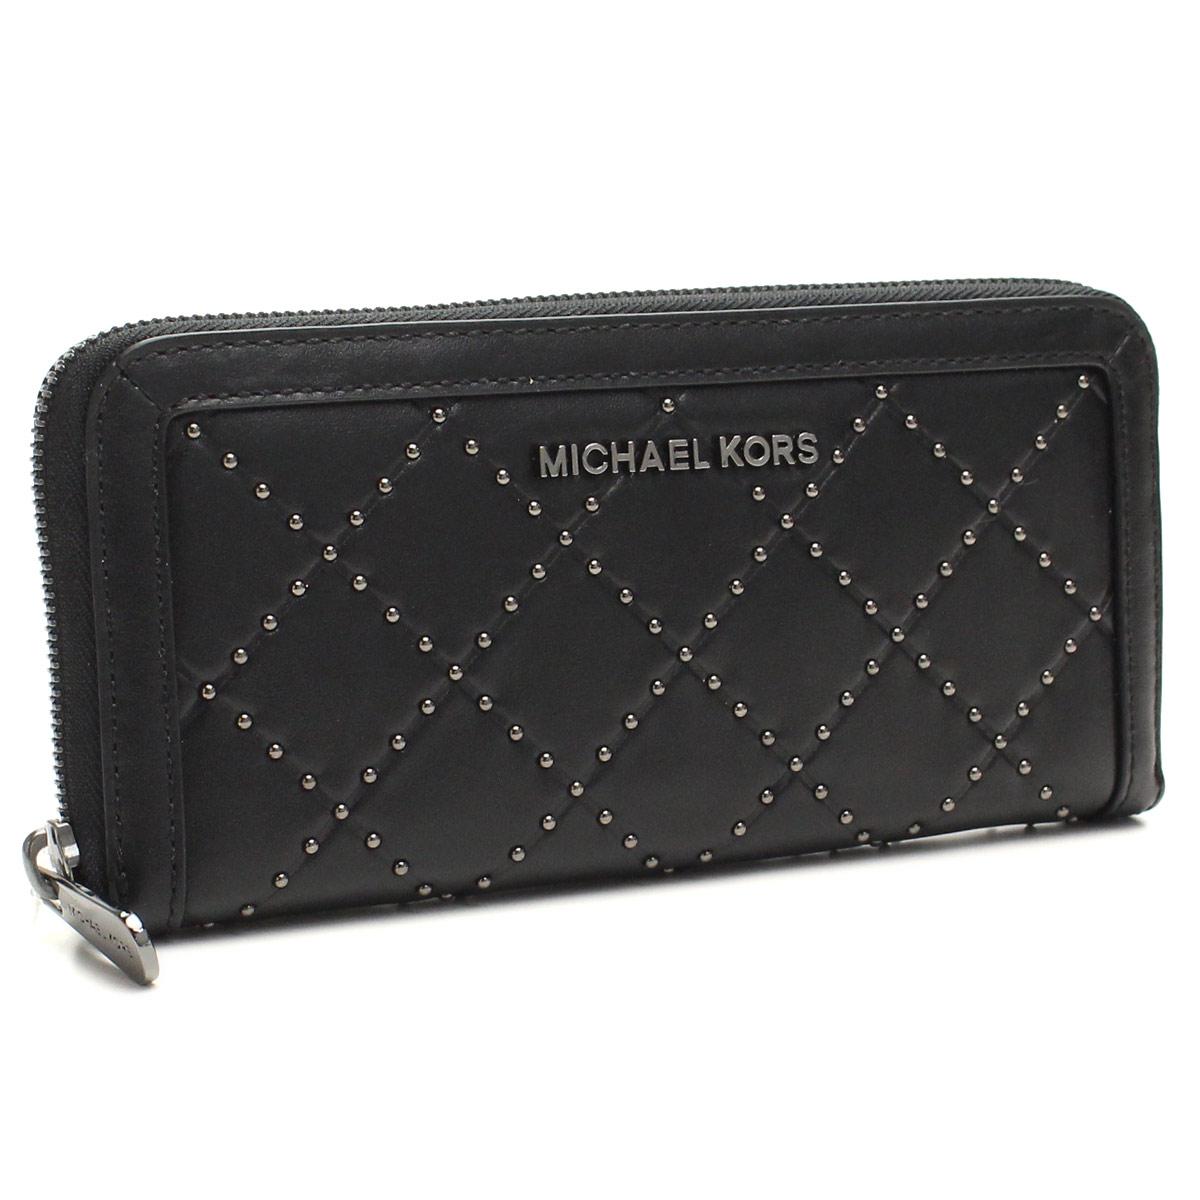 MICHAEL KORS 32F5TM1E2L-BLACKマイケルコース  ラウンドファスナー長財布レザー BLACK/金具ガンメタリック